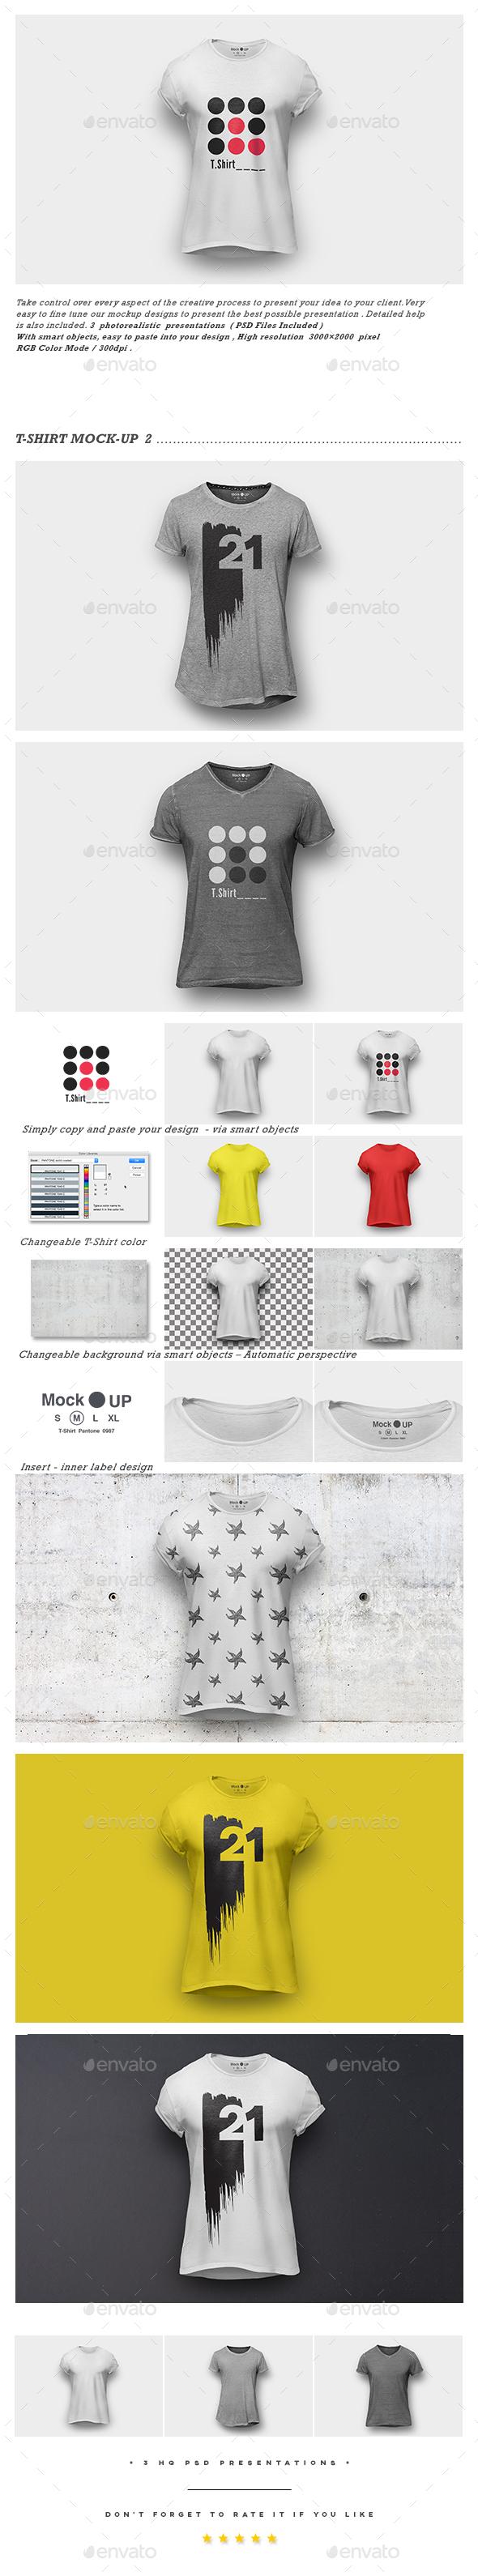 T-Shirt Mock-up 2